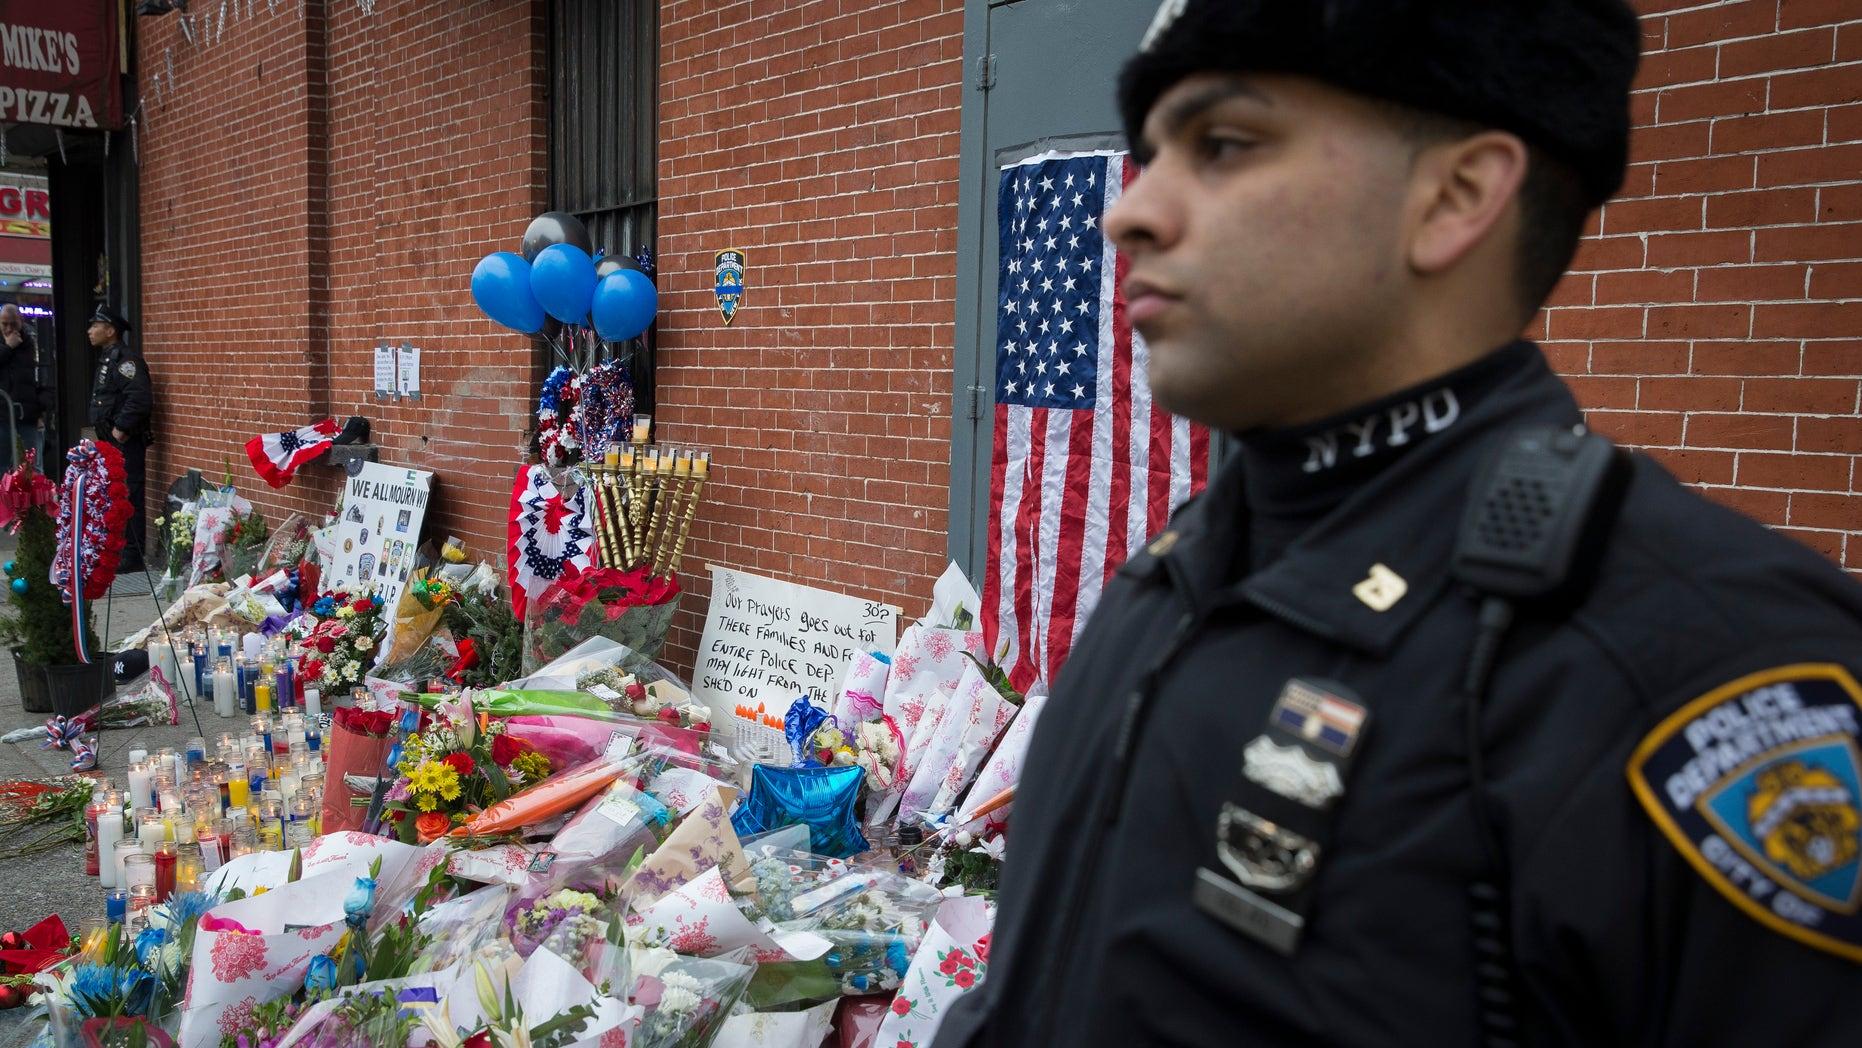 Dec. 22, 2014: A New York Police Department officer stands guard beside a makeshift memorial.